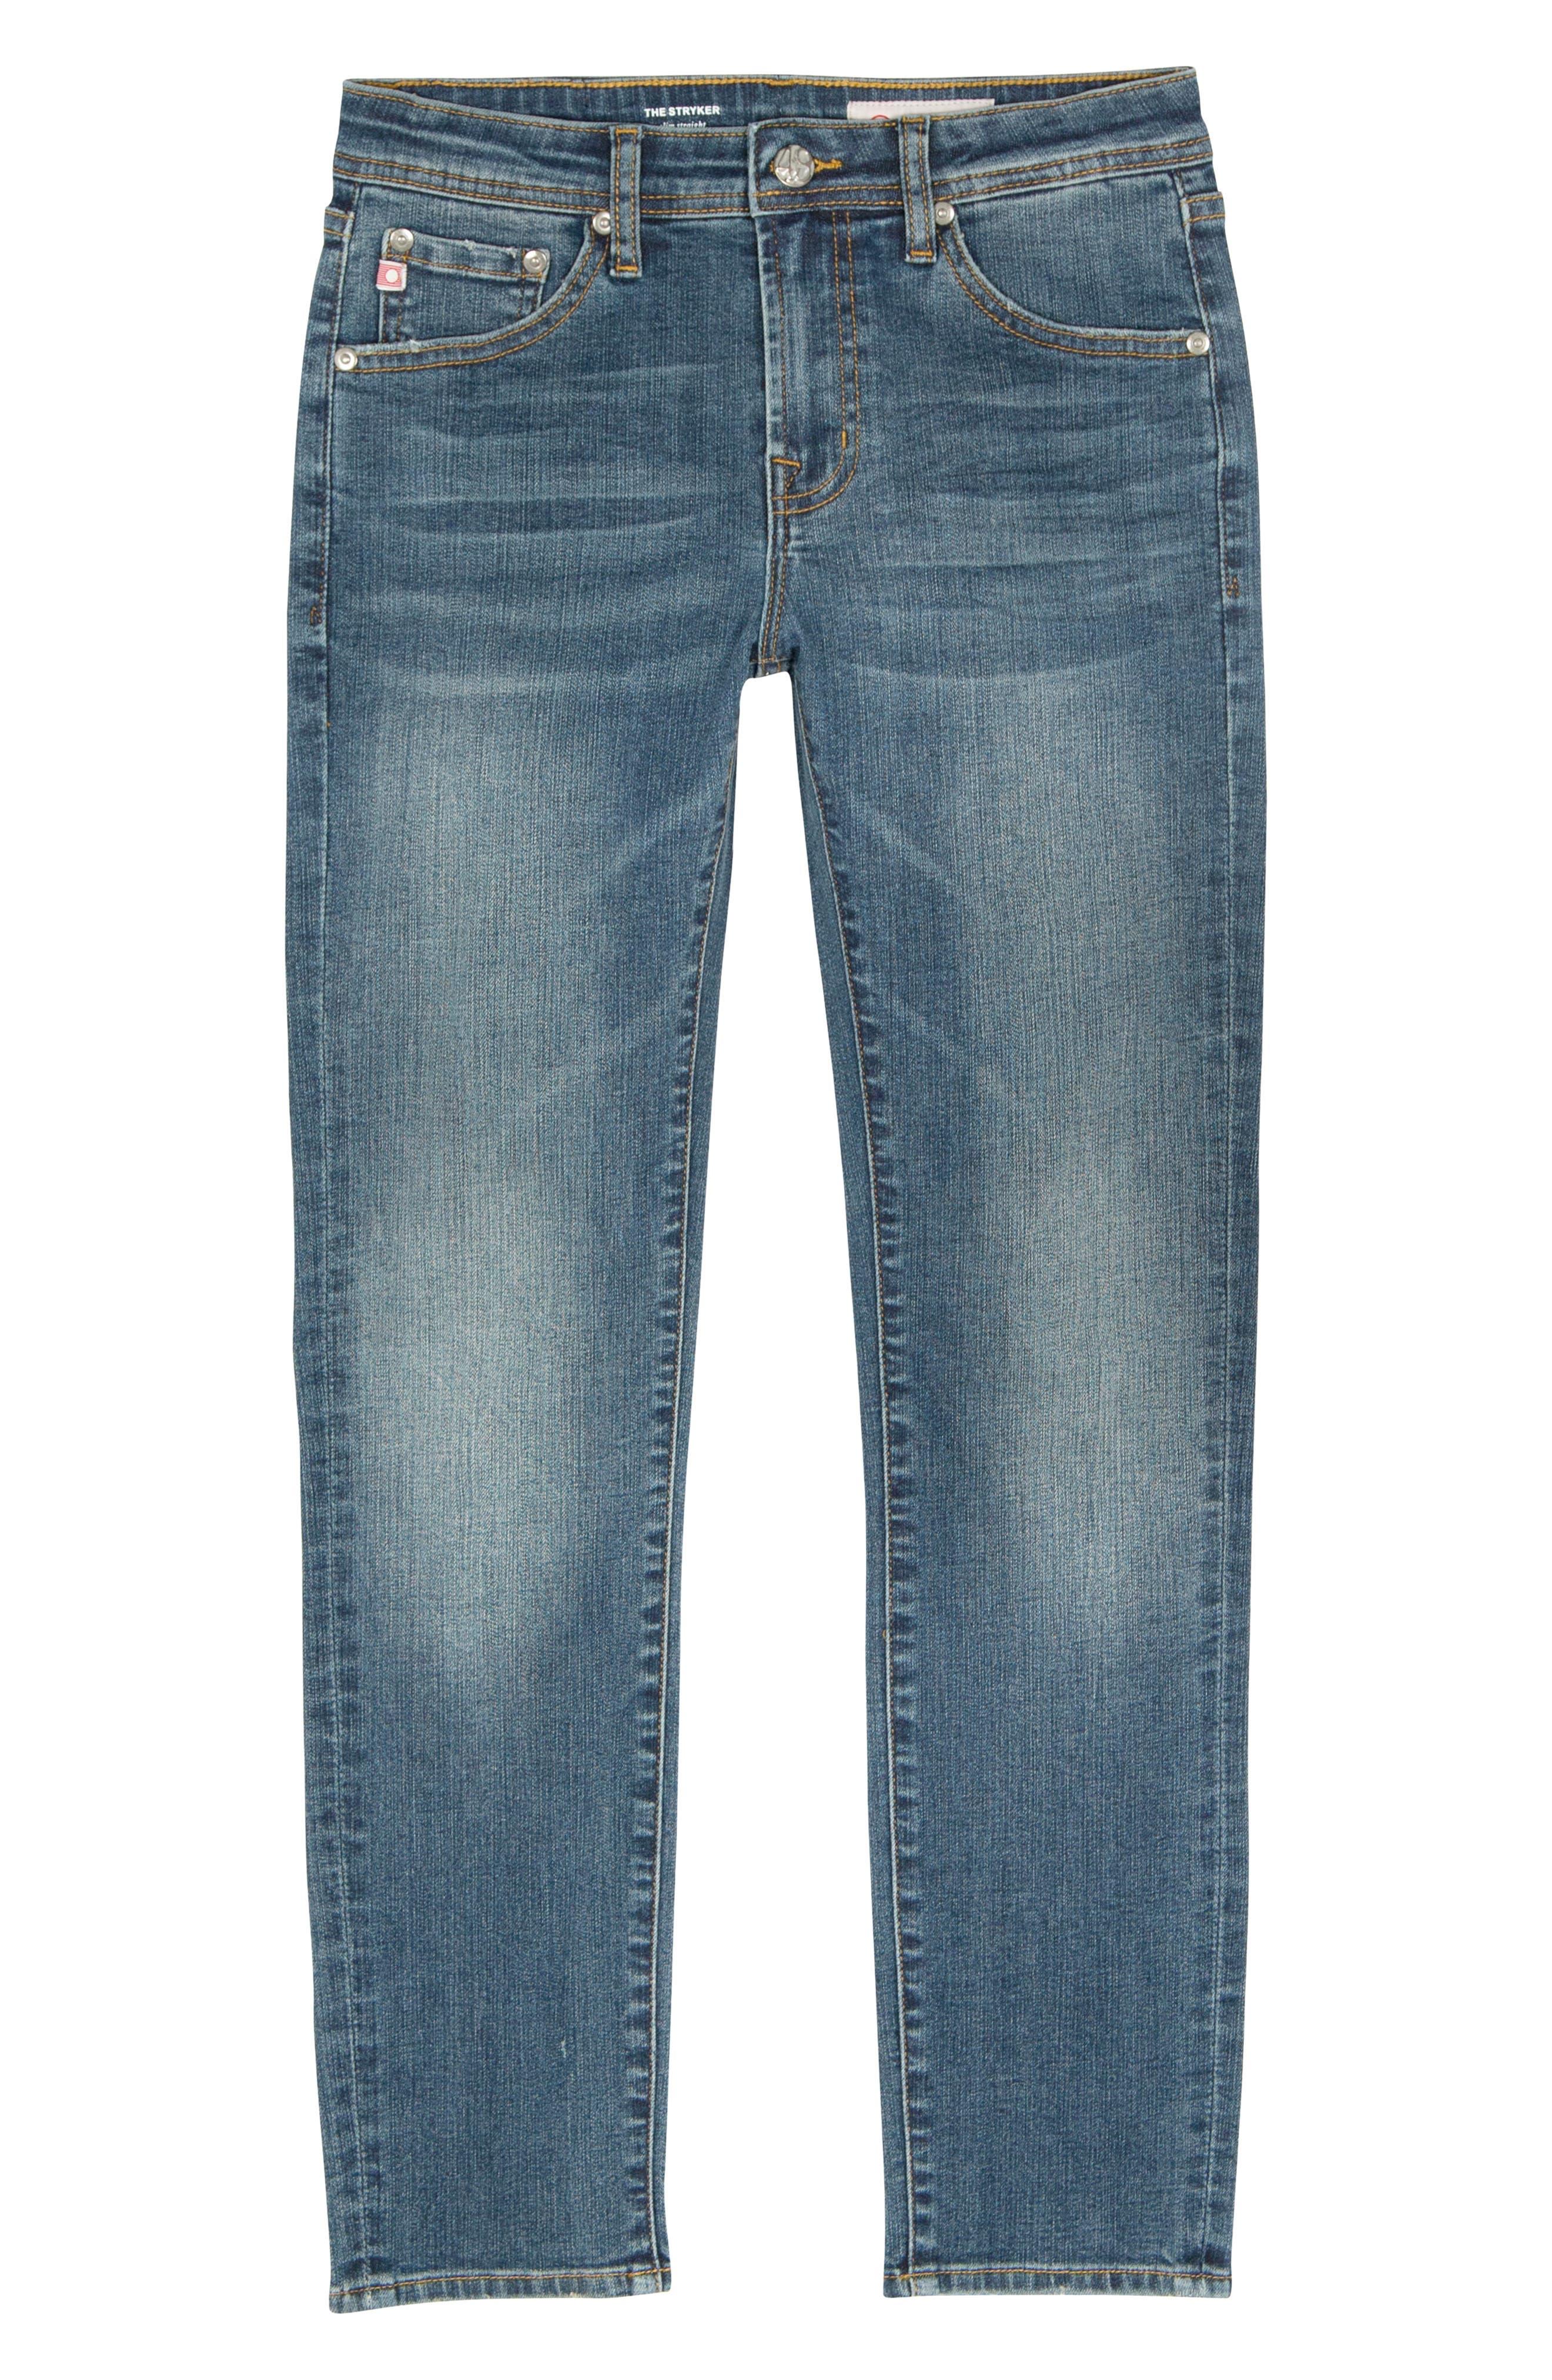 AG ADRIANO GOLDSCHMIED KIDS The Stryker Slim Straight Leg Jeans, Main, color, HIPPIE SKY